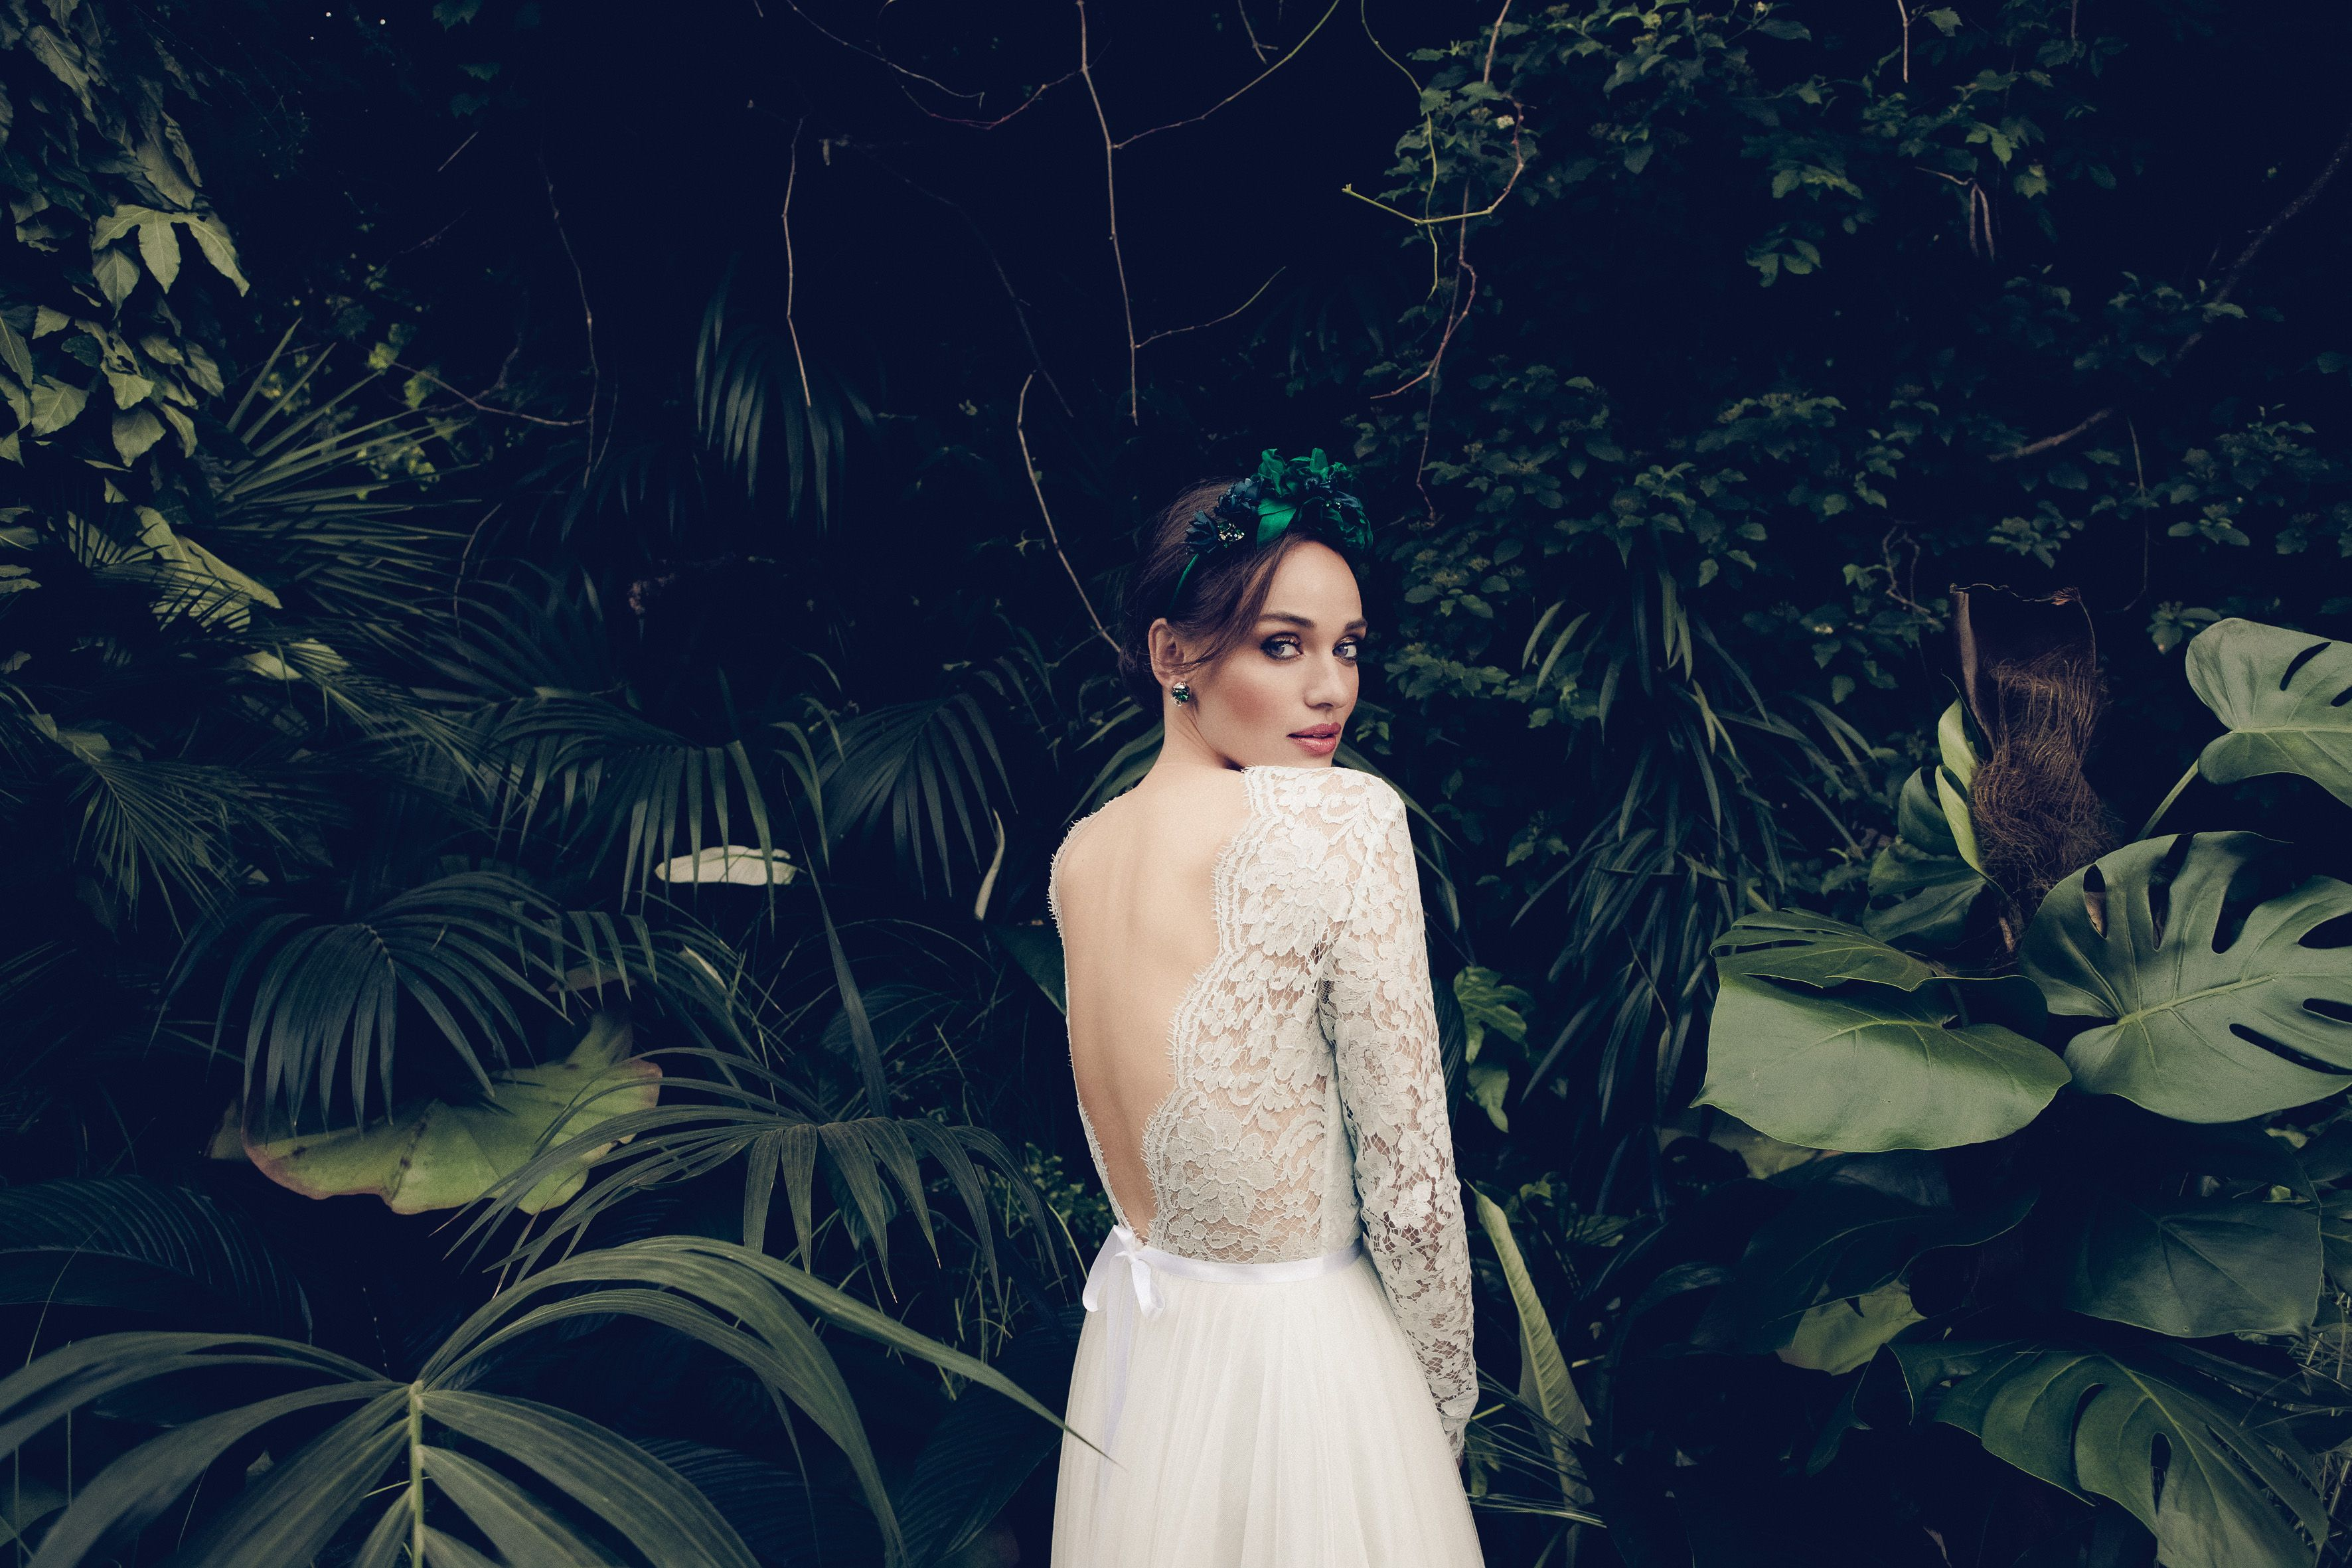 Das Brautkleid 2.0: So heiraten Fashionistas 2017! | Brautmode ...